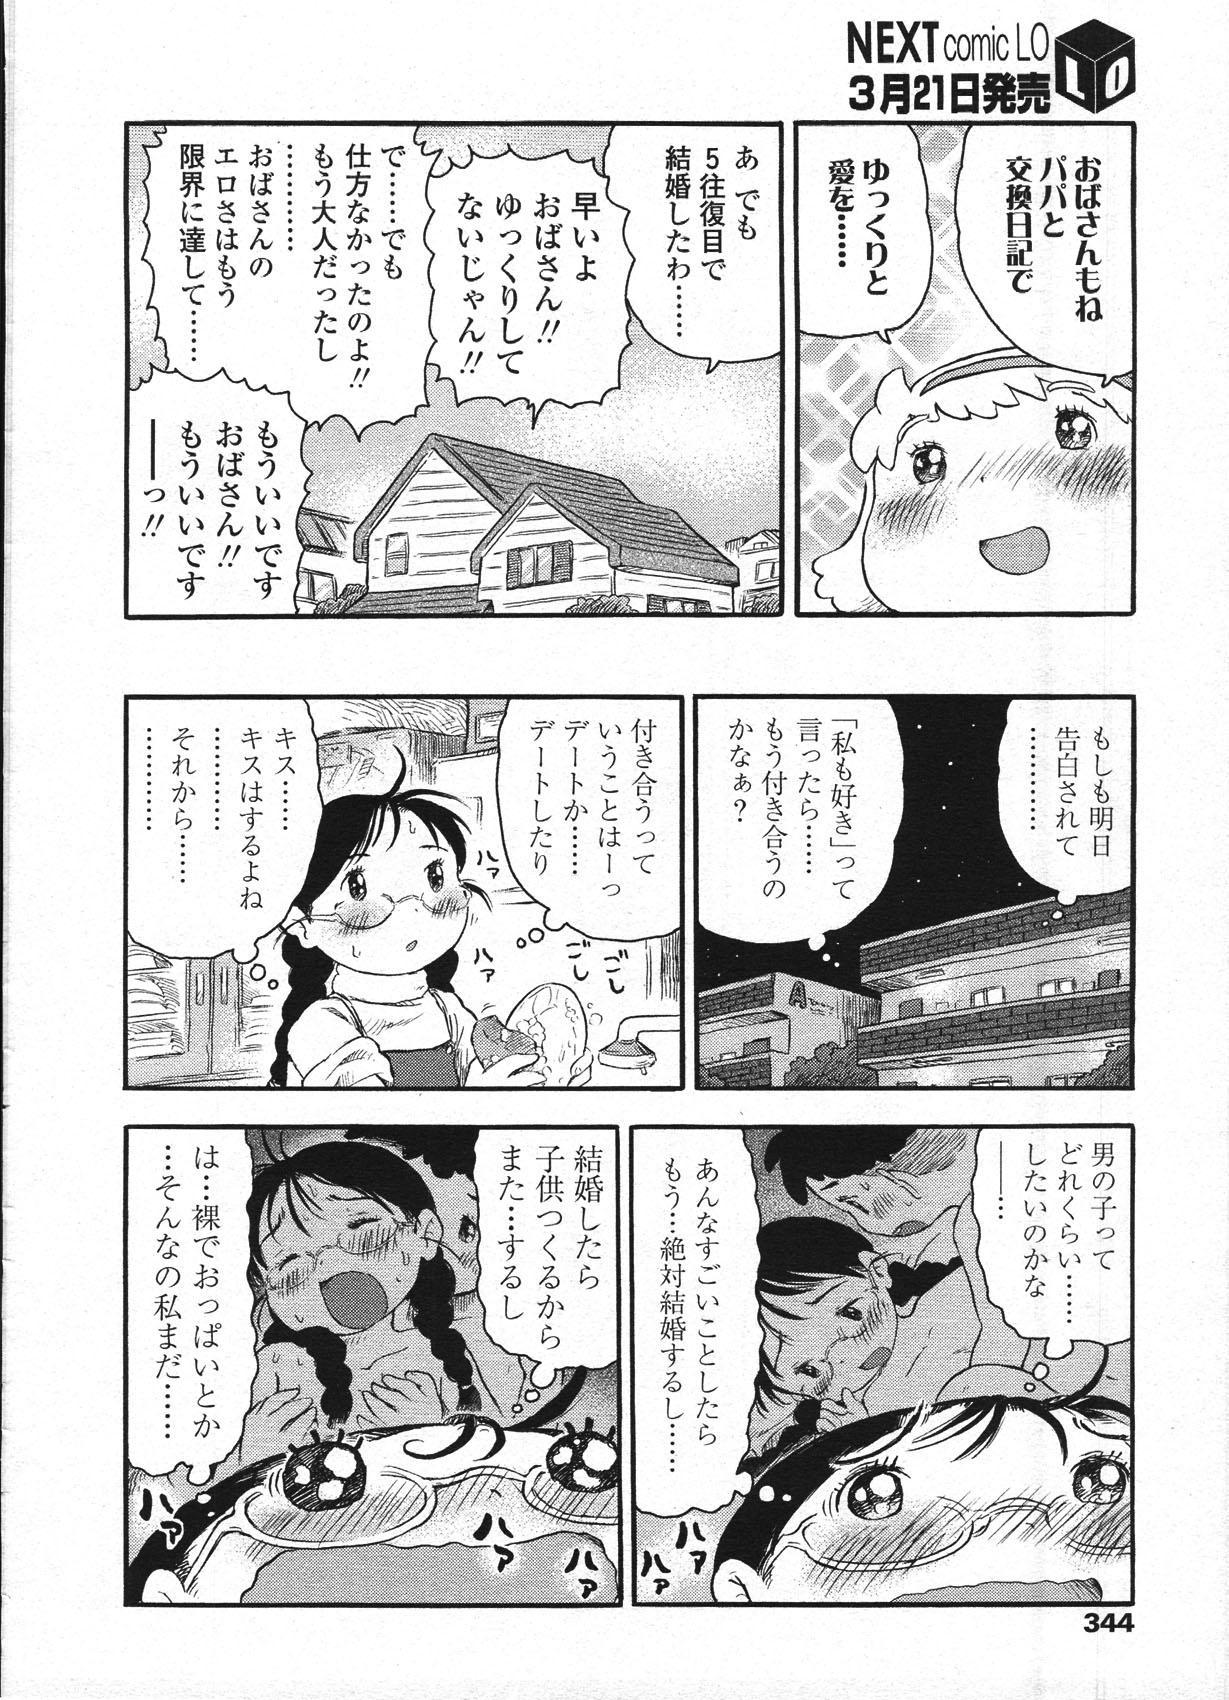 Comic LO 2009-04 Vol. 61 346